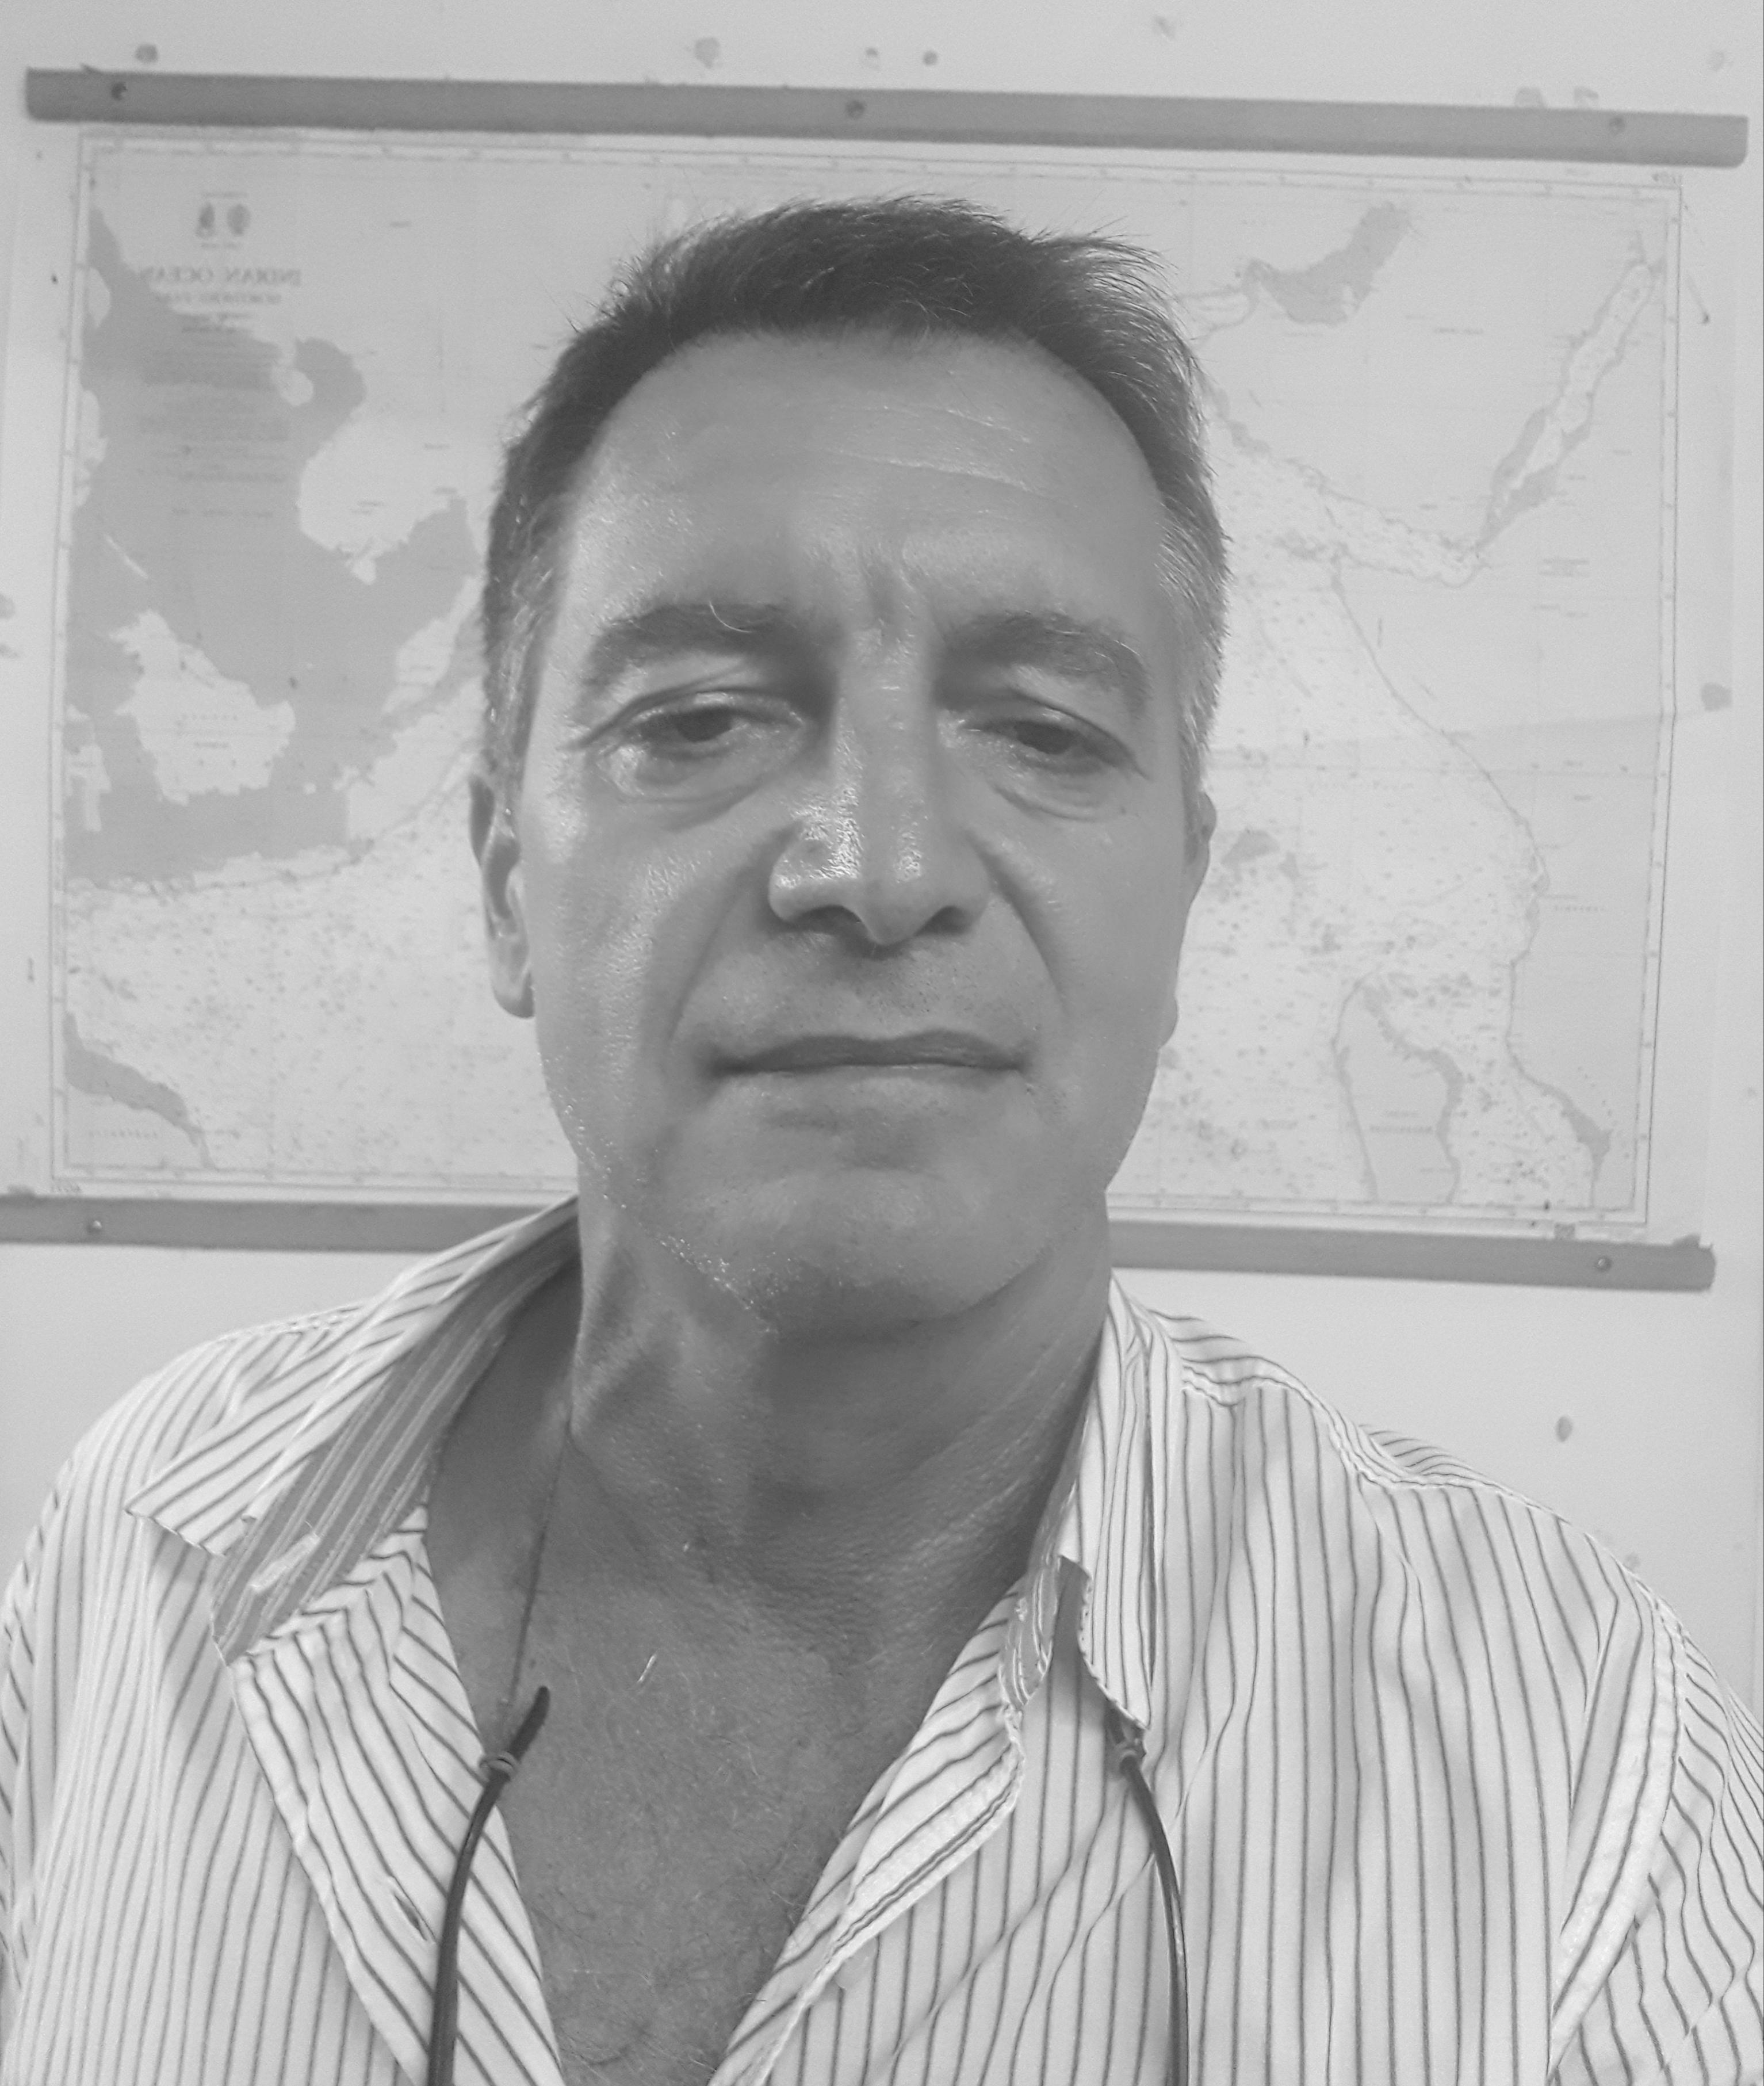 Amit Wasserberg